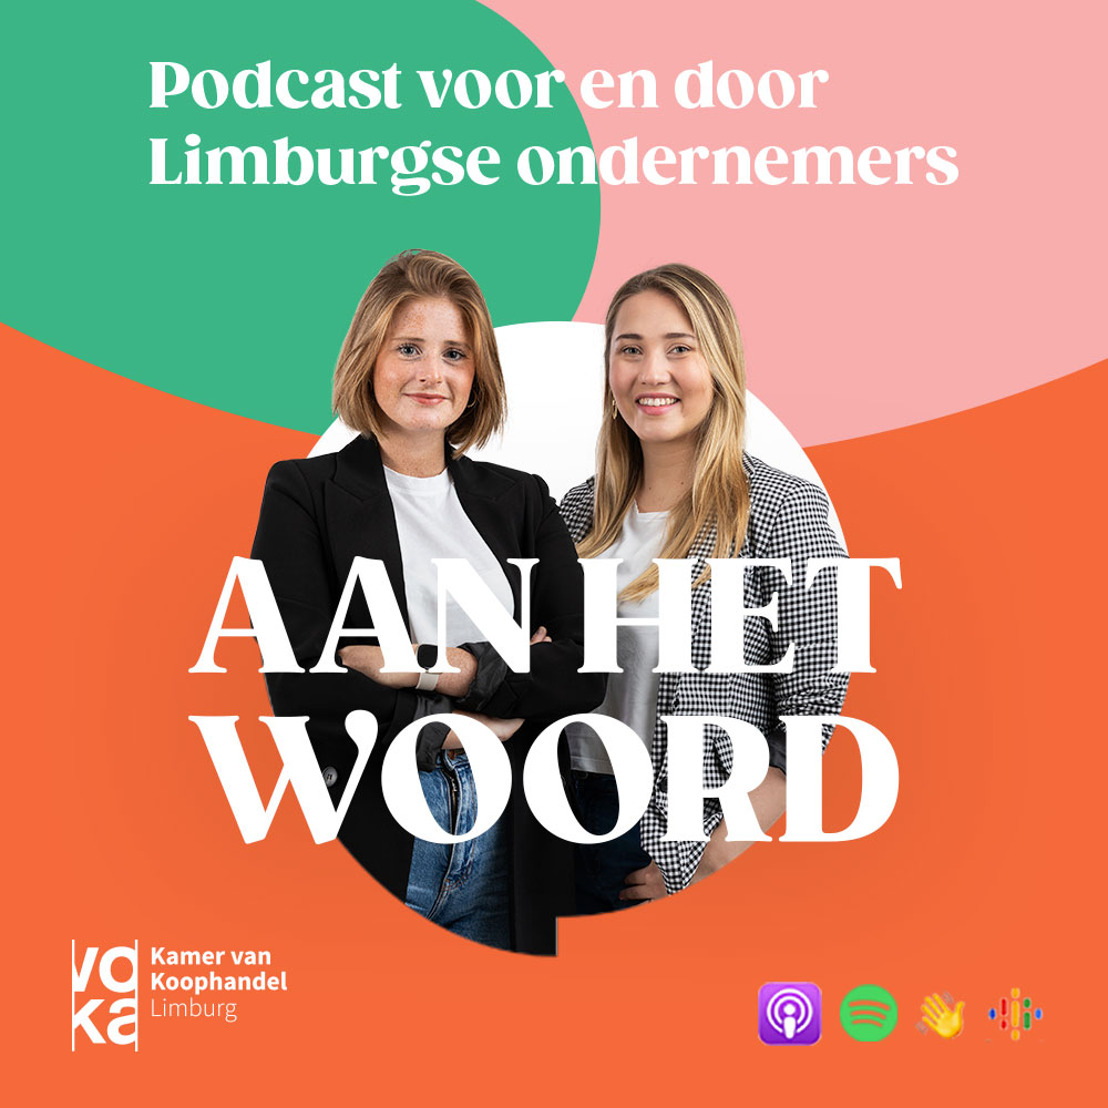 Voka – KvK Limburg lanceert podcast over ondernemerschap